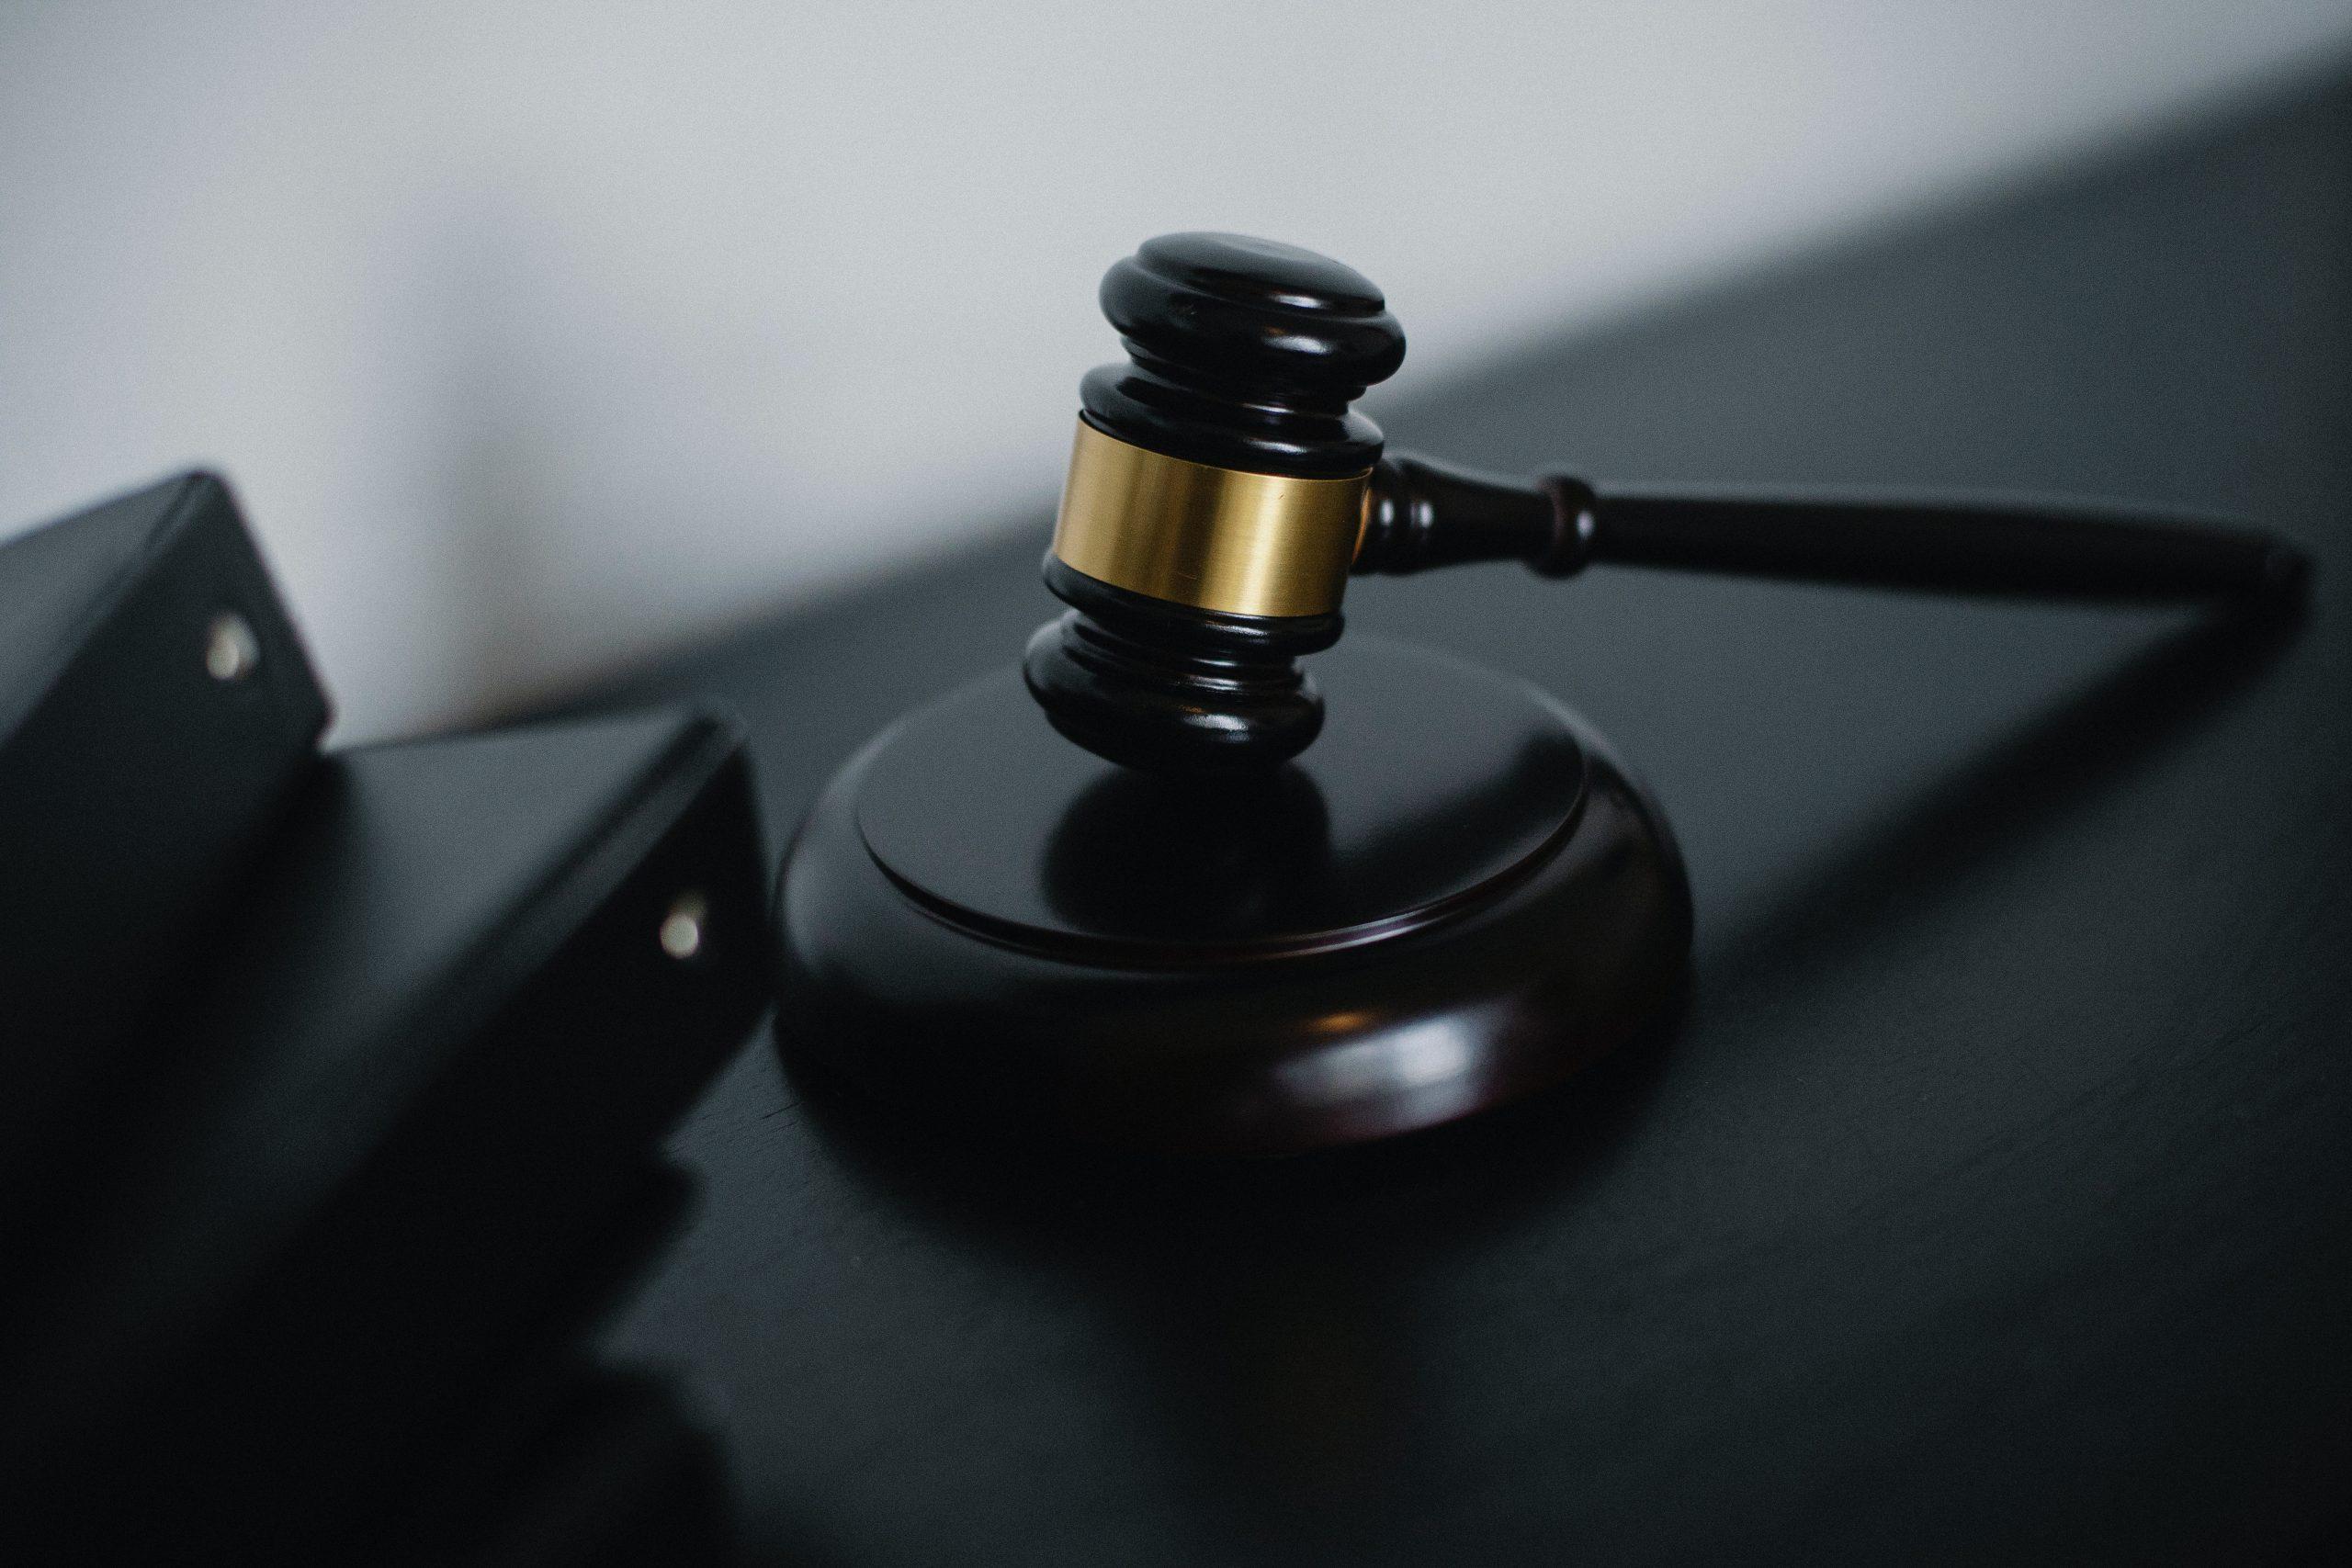 Falta reiterada de depósitos de FGTS condena empregados por dano moral coletivo